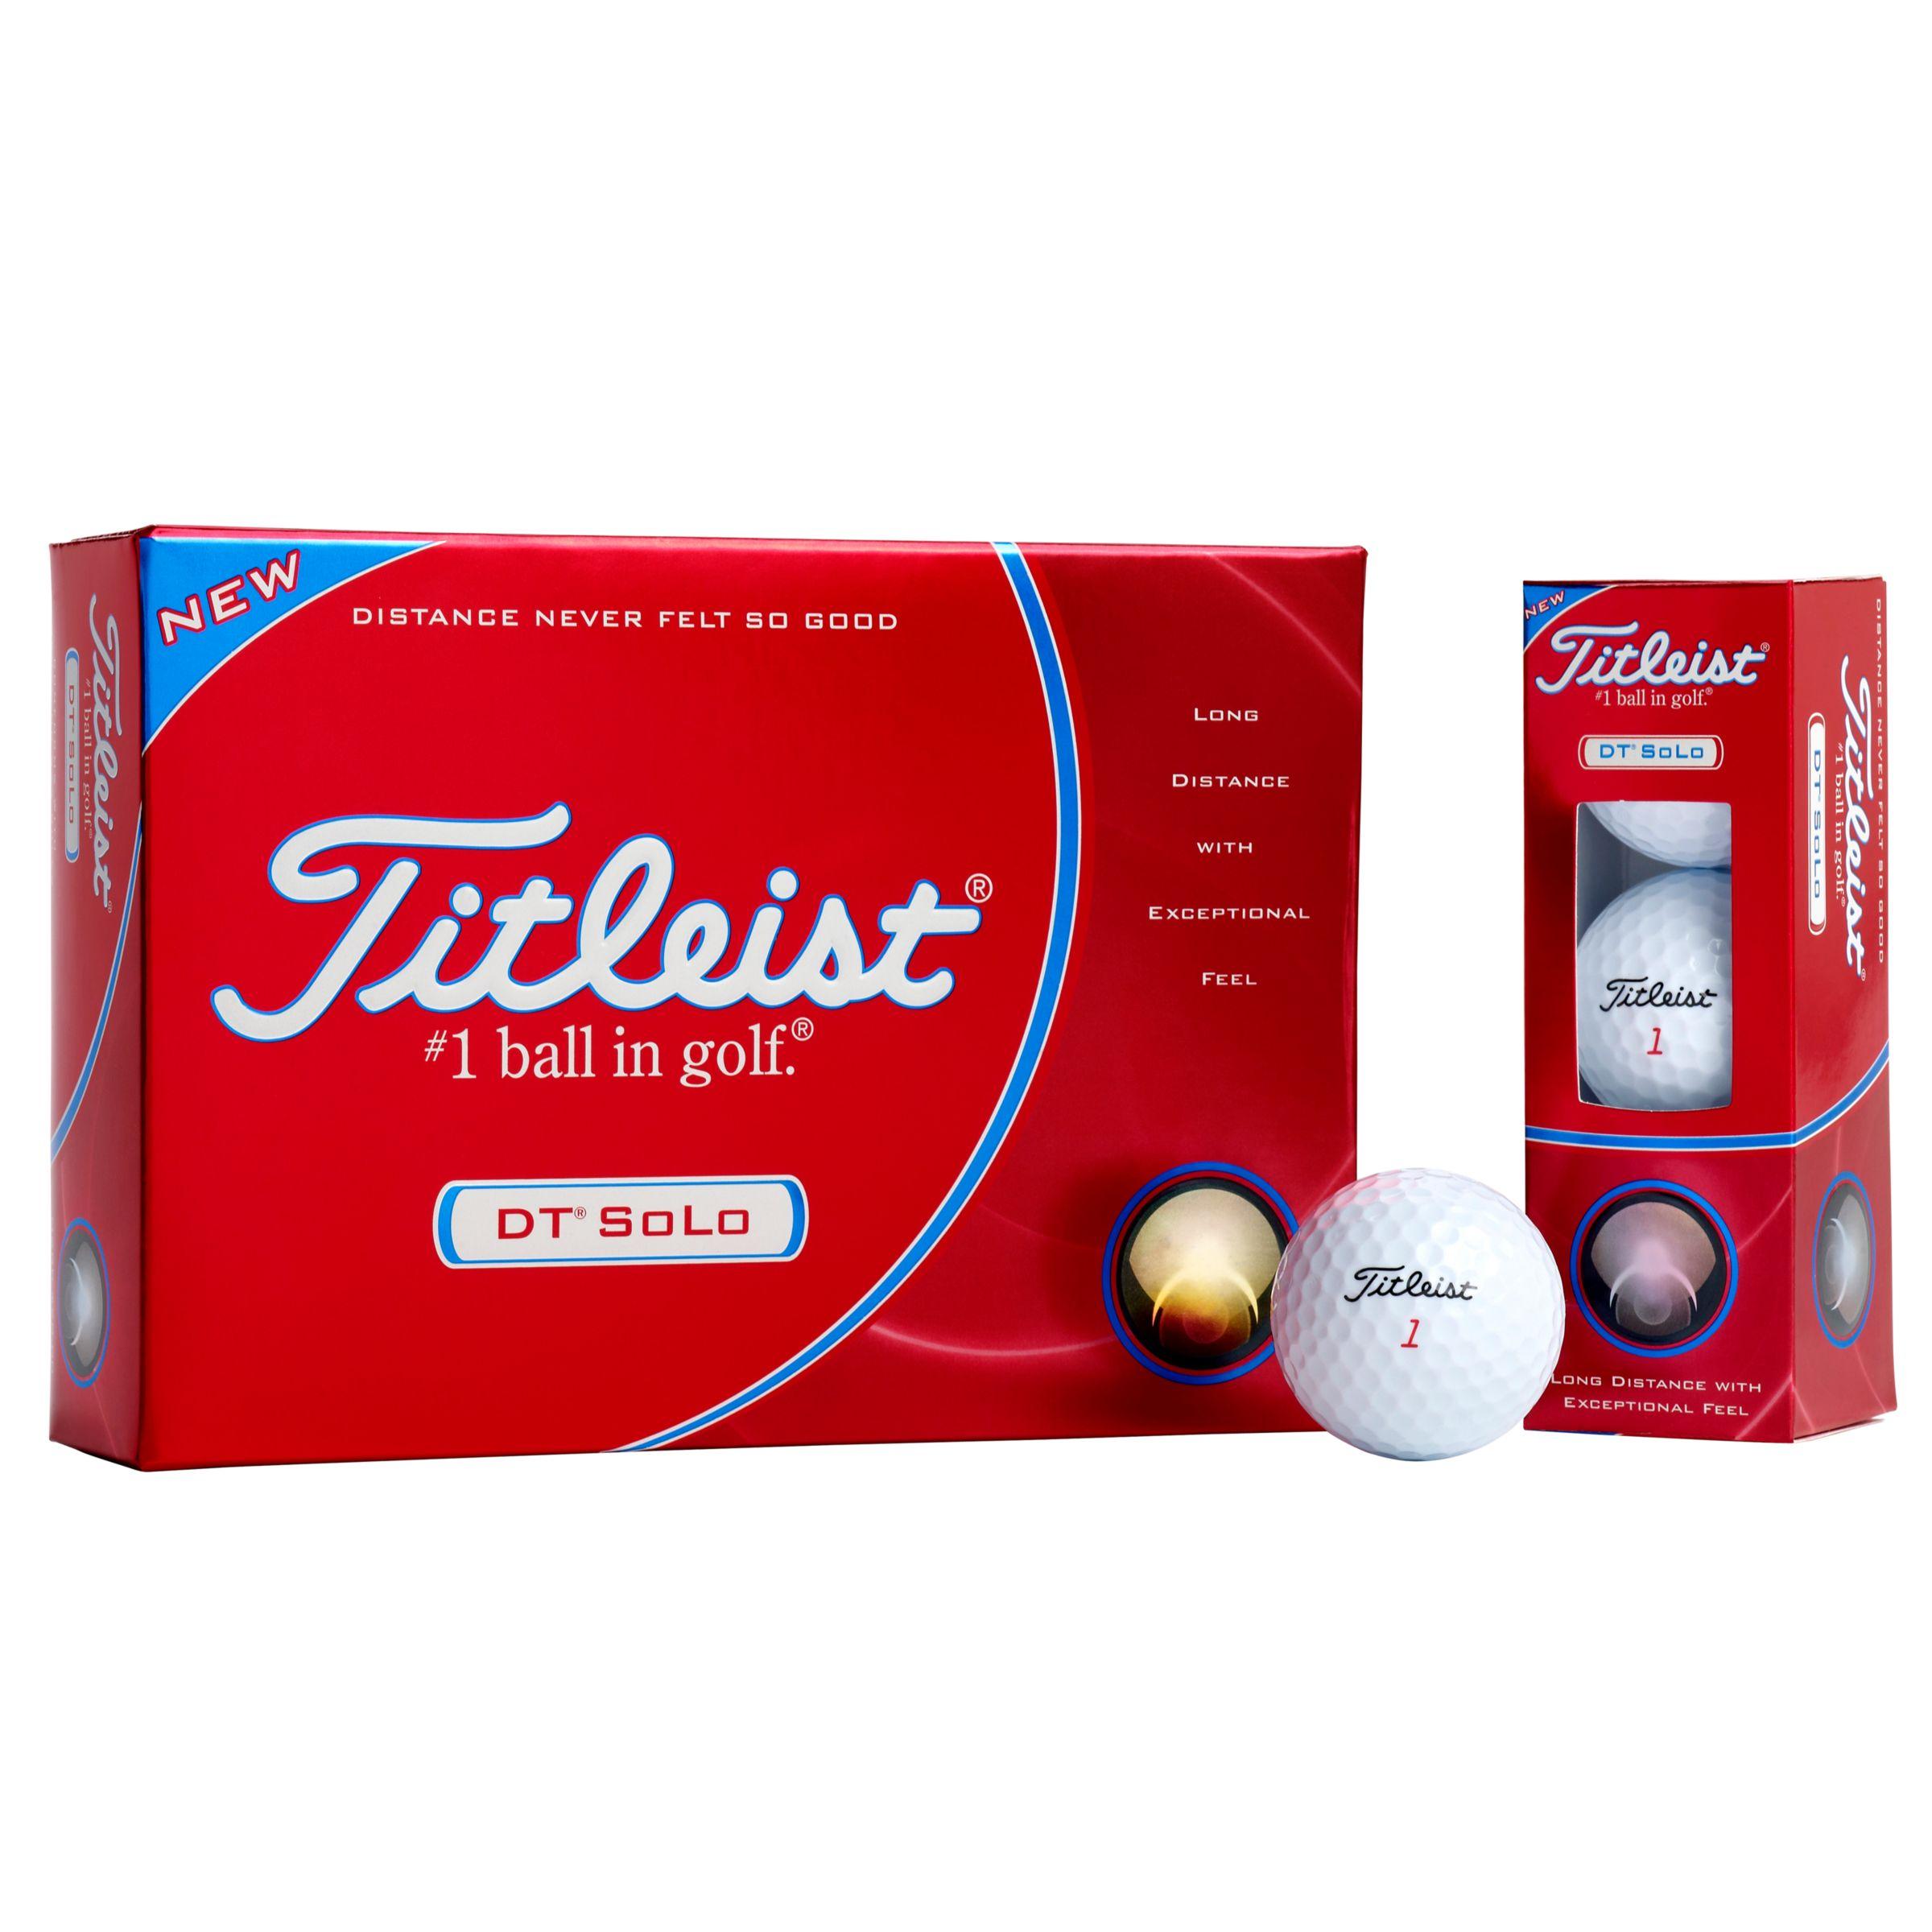 DT Solo Golf Balls, Pack of 12, White